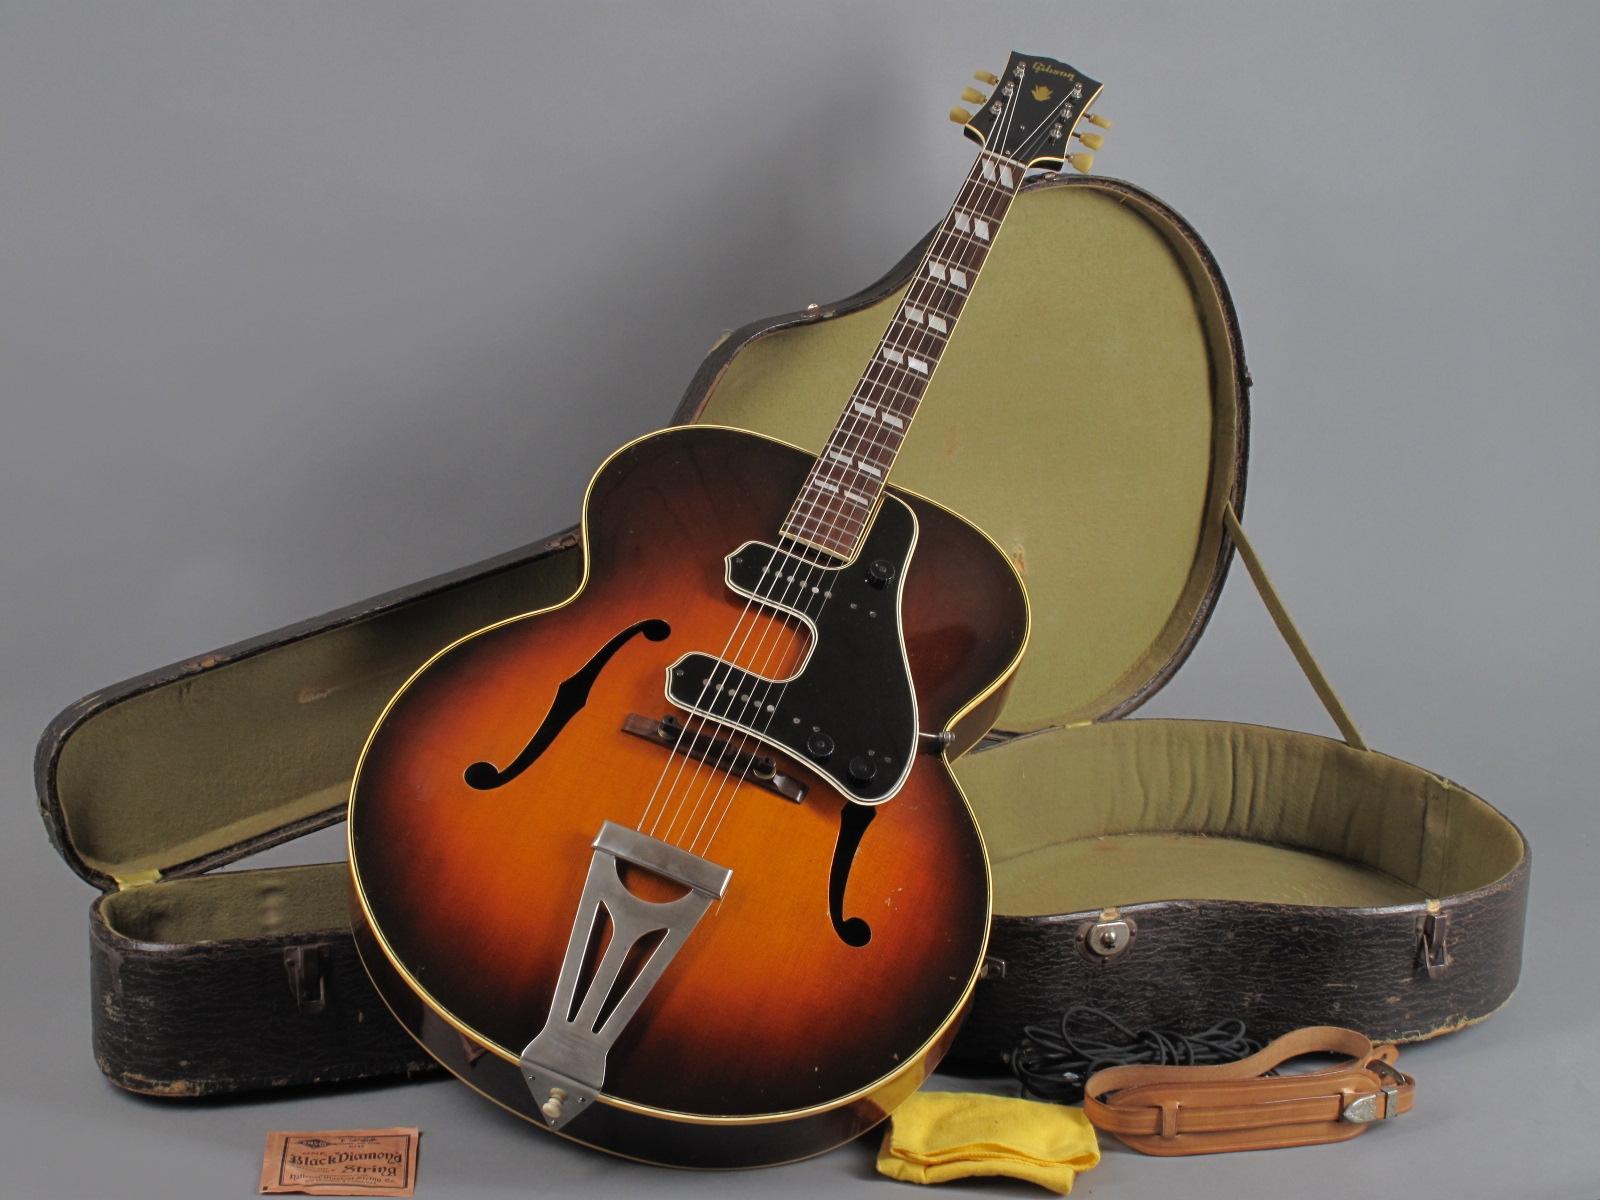 https://guitarpoint.de/app/uploads/products/1948-gibson-super-300-sunburst-w-original-mccarty-unit/1948-Gibson-ES-300-Sunburst-A2174_9.jpg